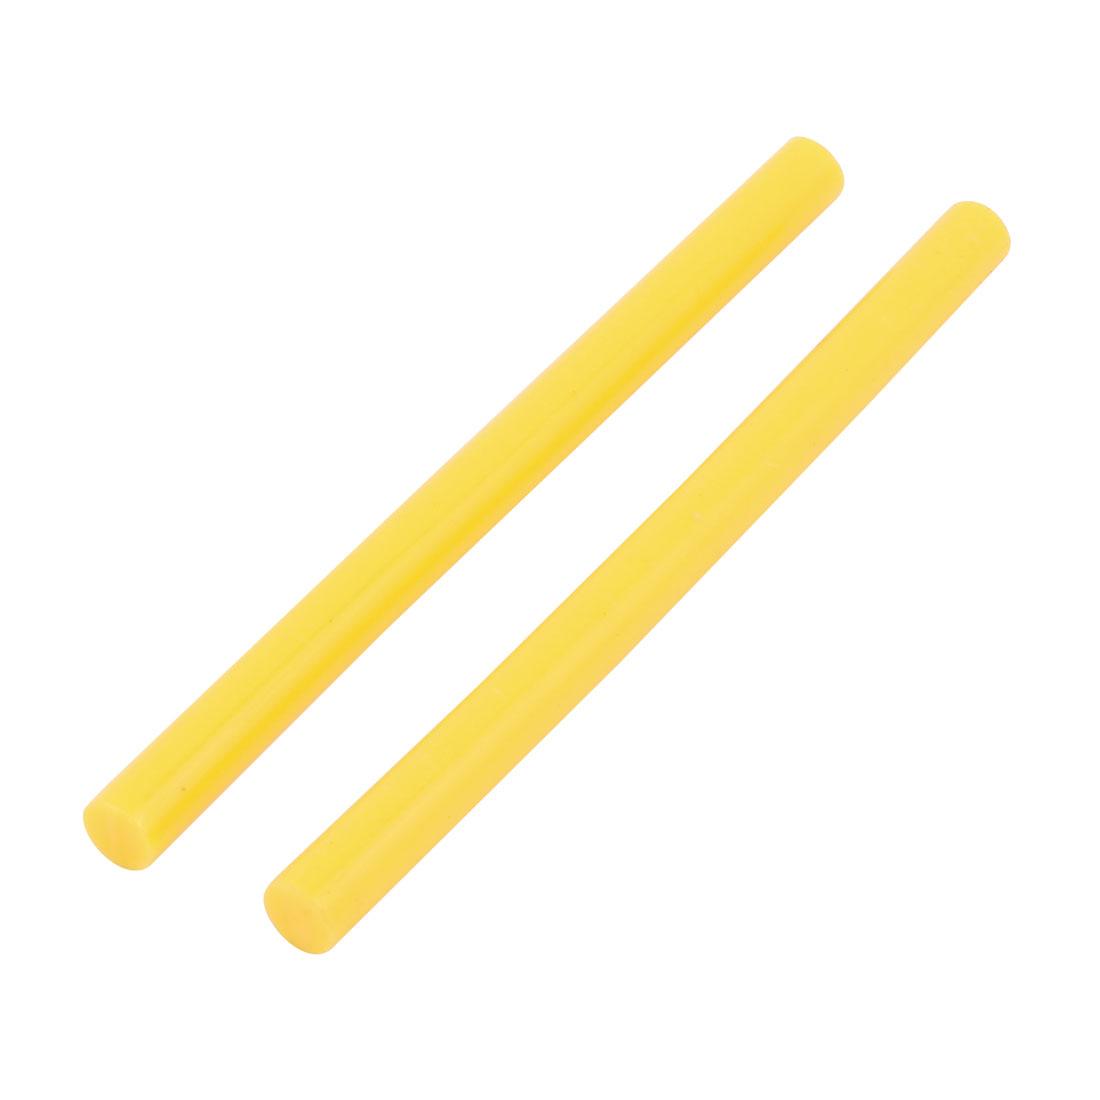 "2Pcs 3.9""Length 7mm Dia Yellow Hot Melt Glue Stick for Electric Tool Heating Gun"